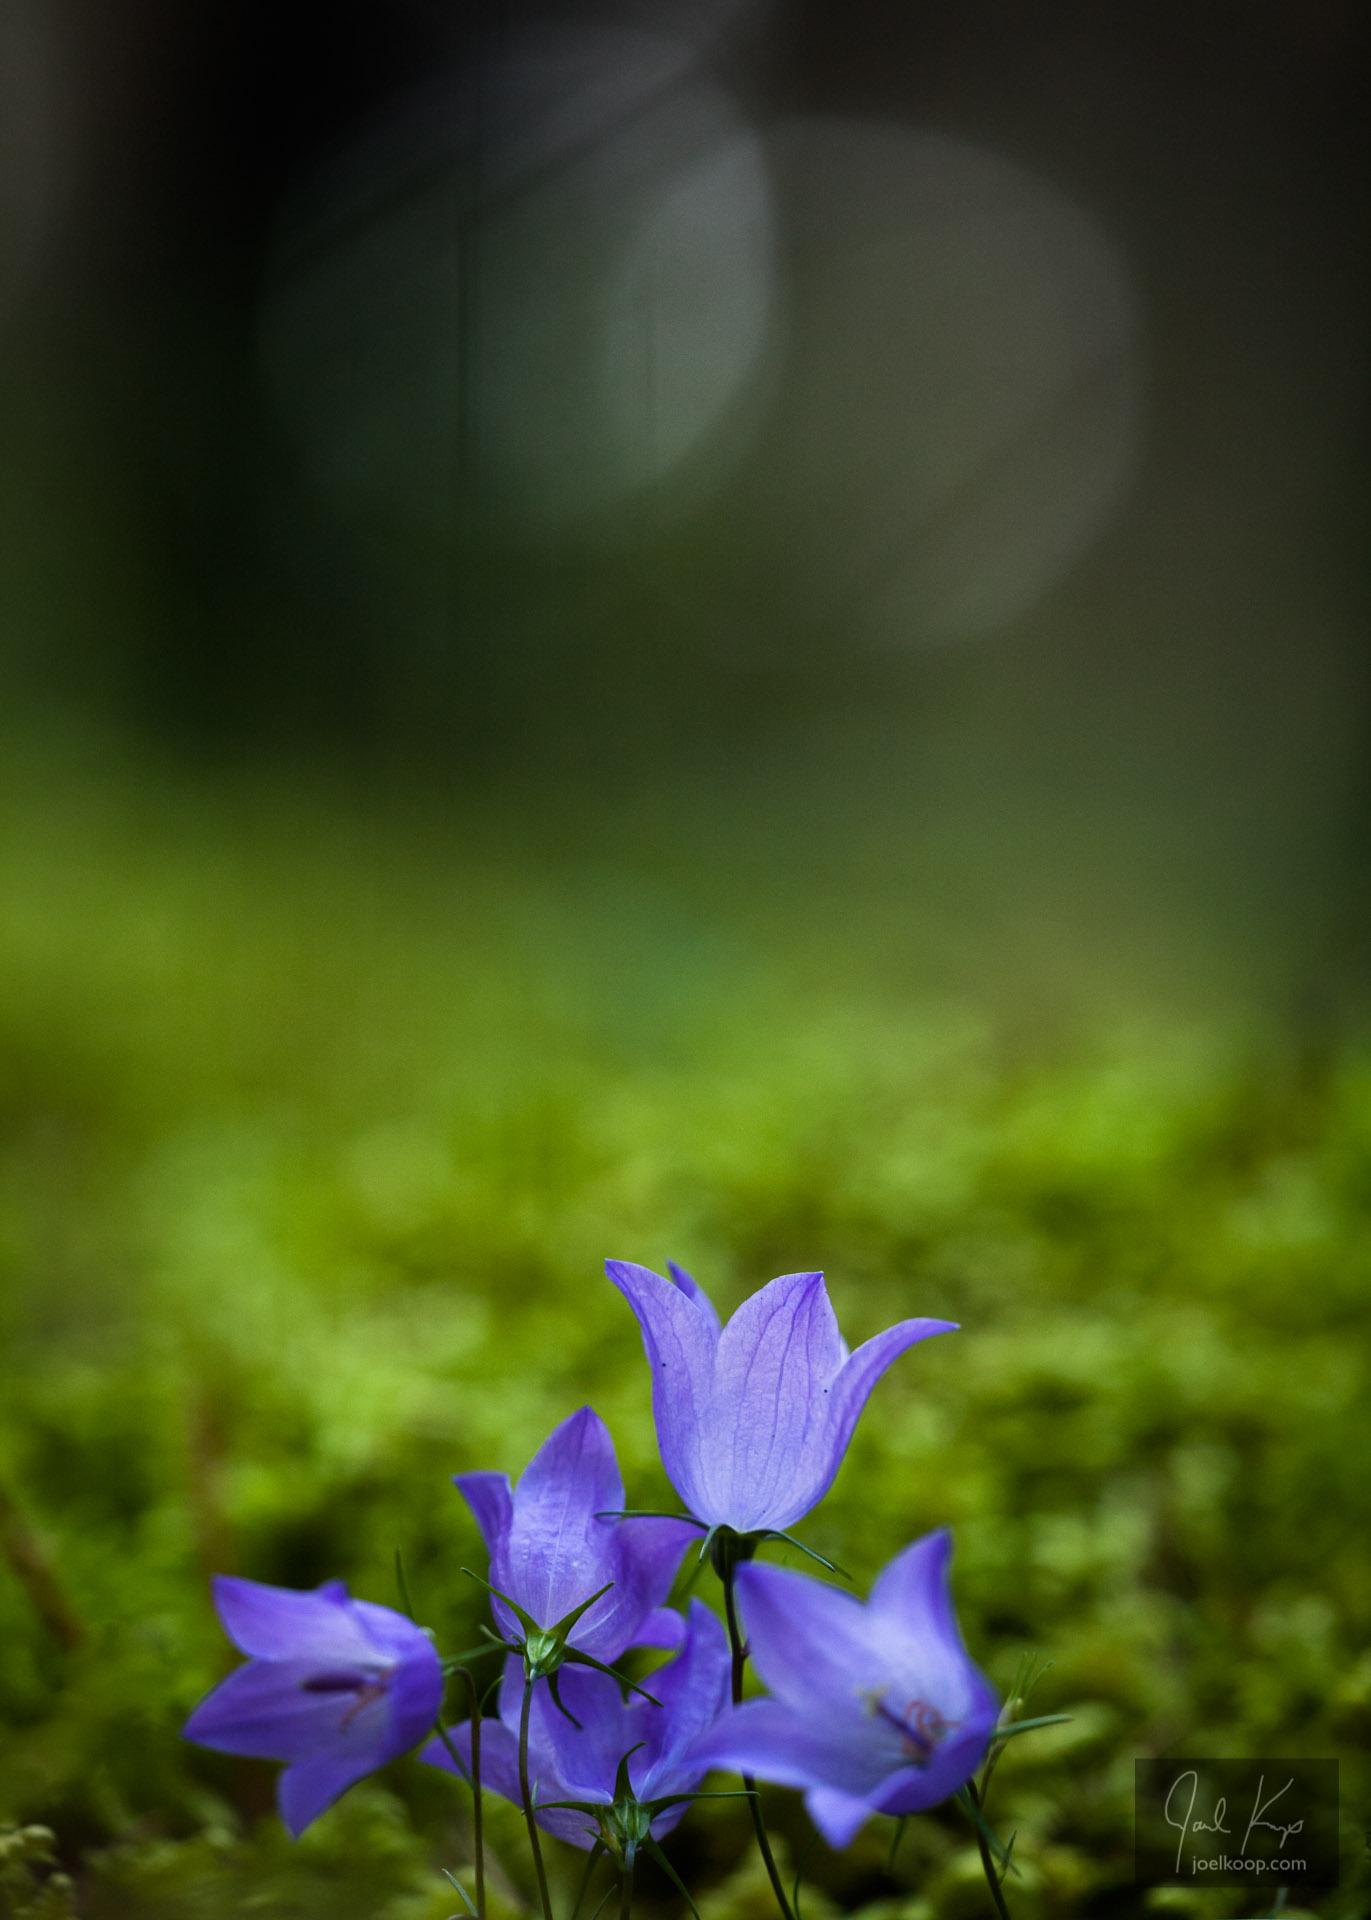 Harebells in Moss